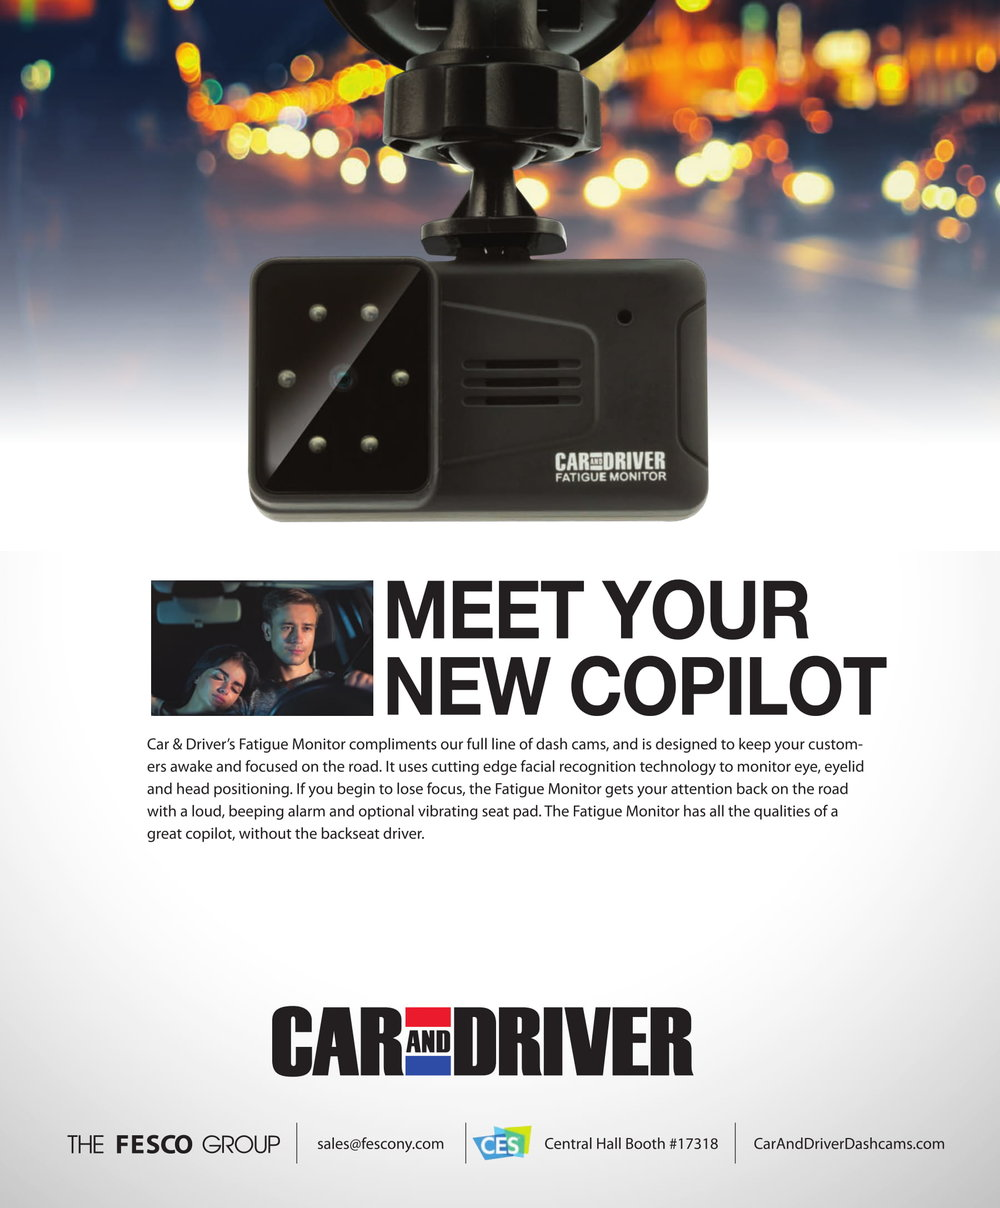 caranddriver2-1.jpg